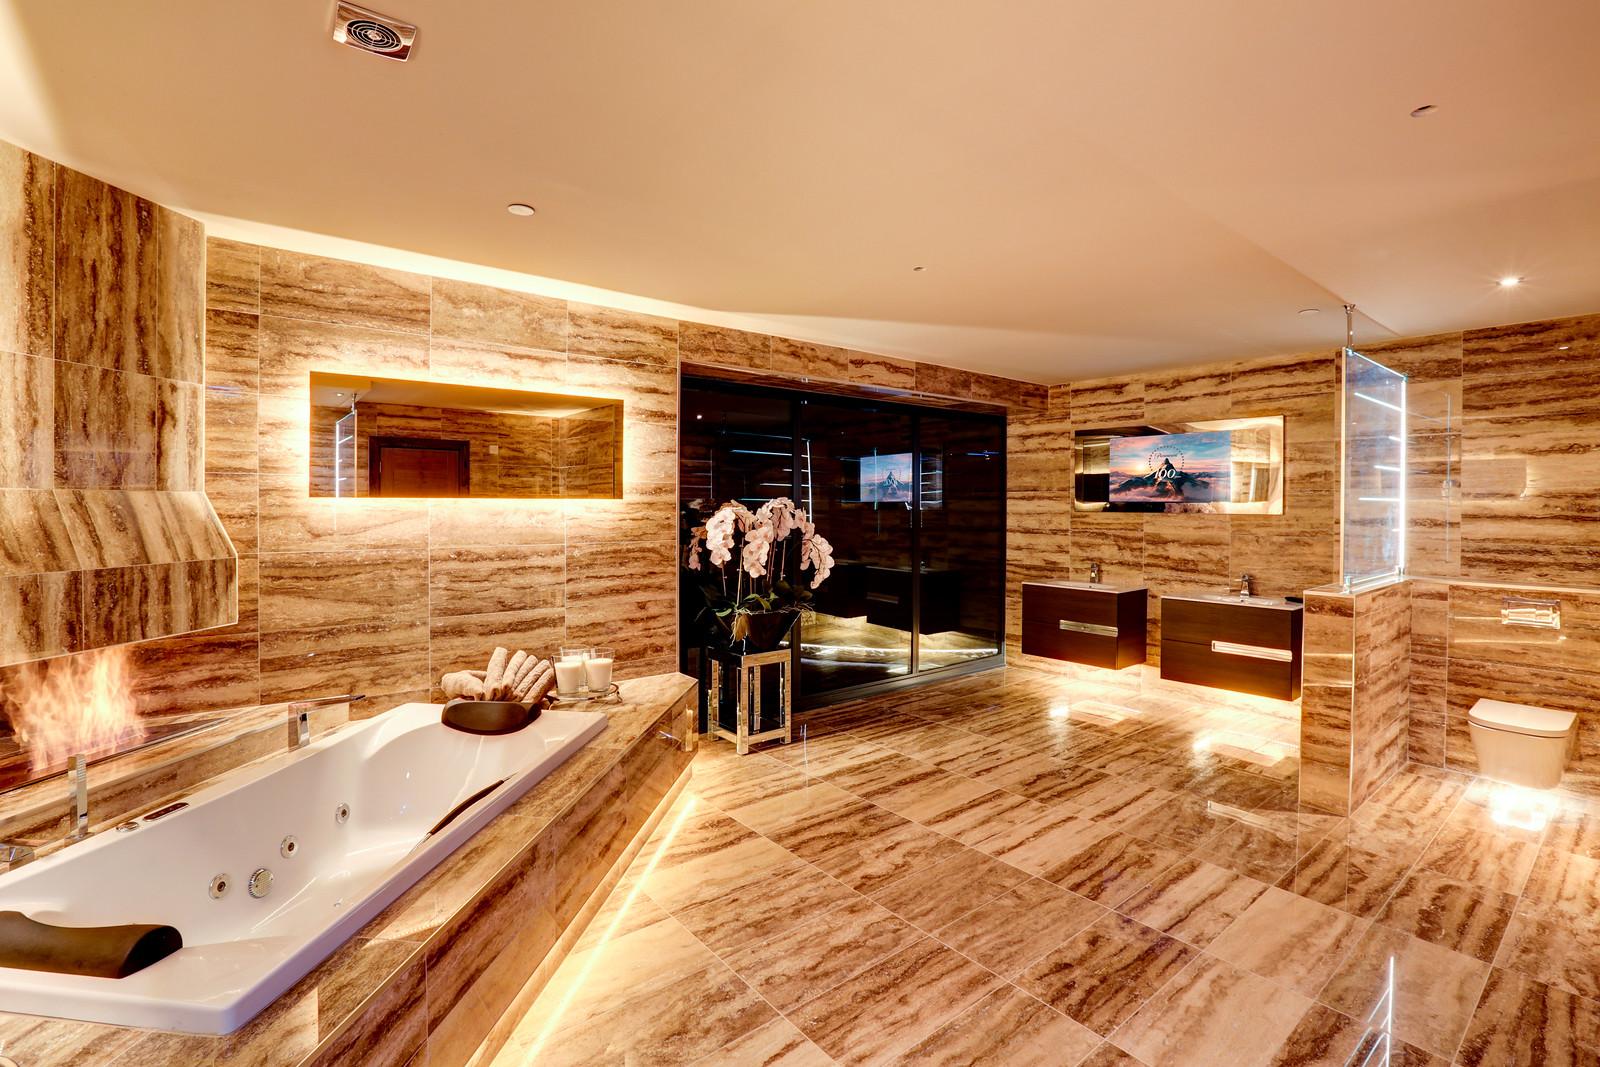 Luxury bathroom, tanglewood colston bassett